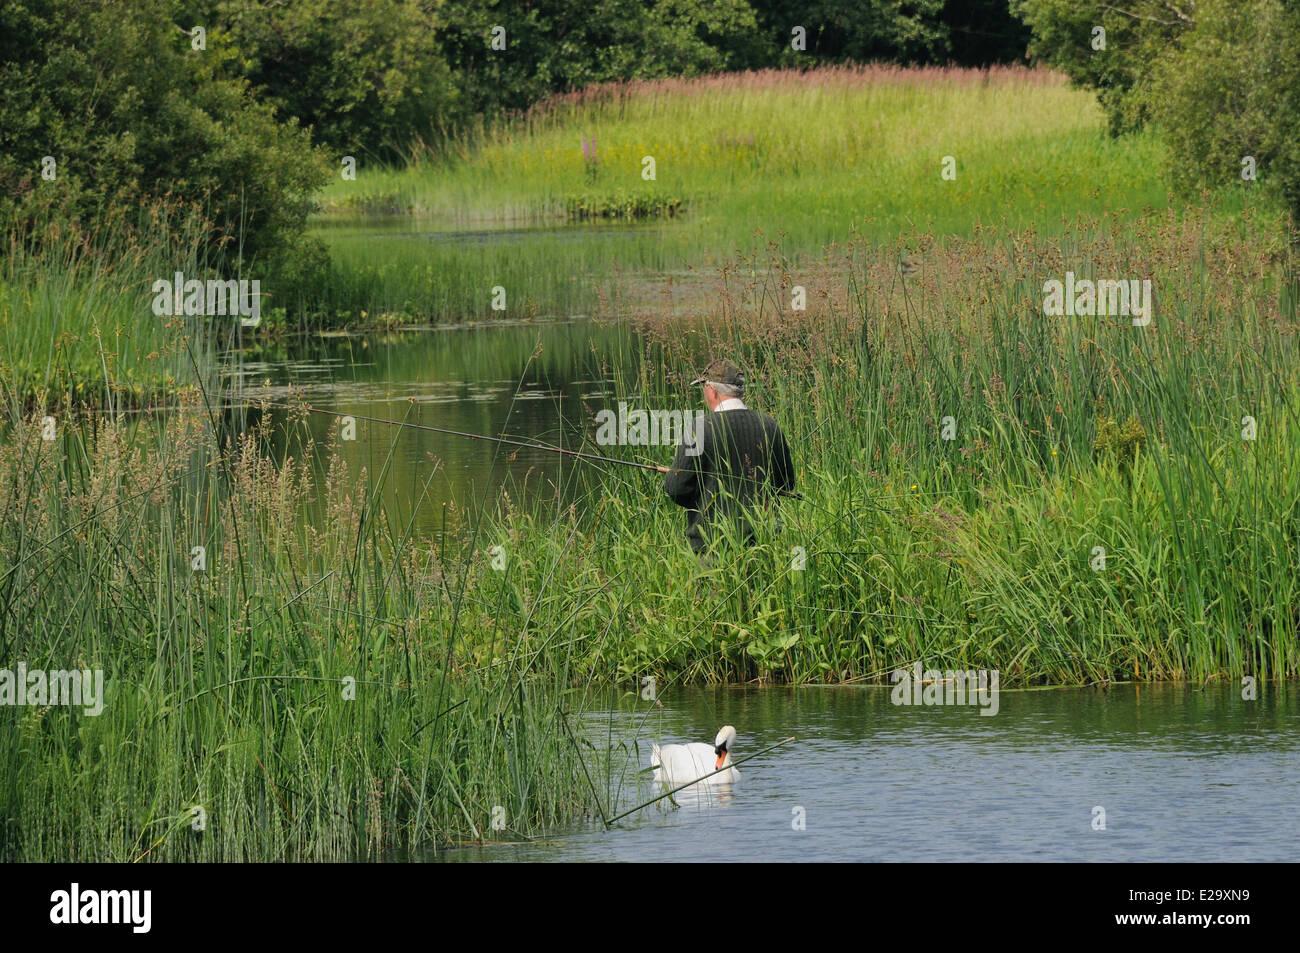 Ireland, County Mayo, Cong, Fisherman fishing in Cong river - Stock Image